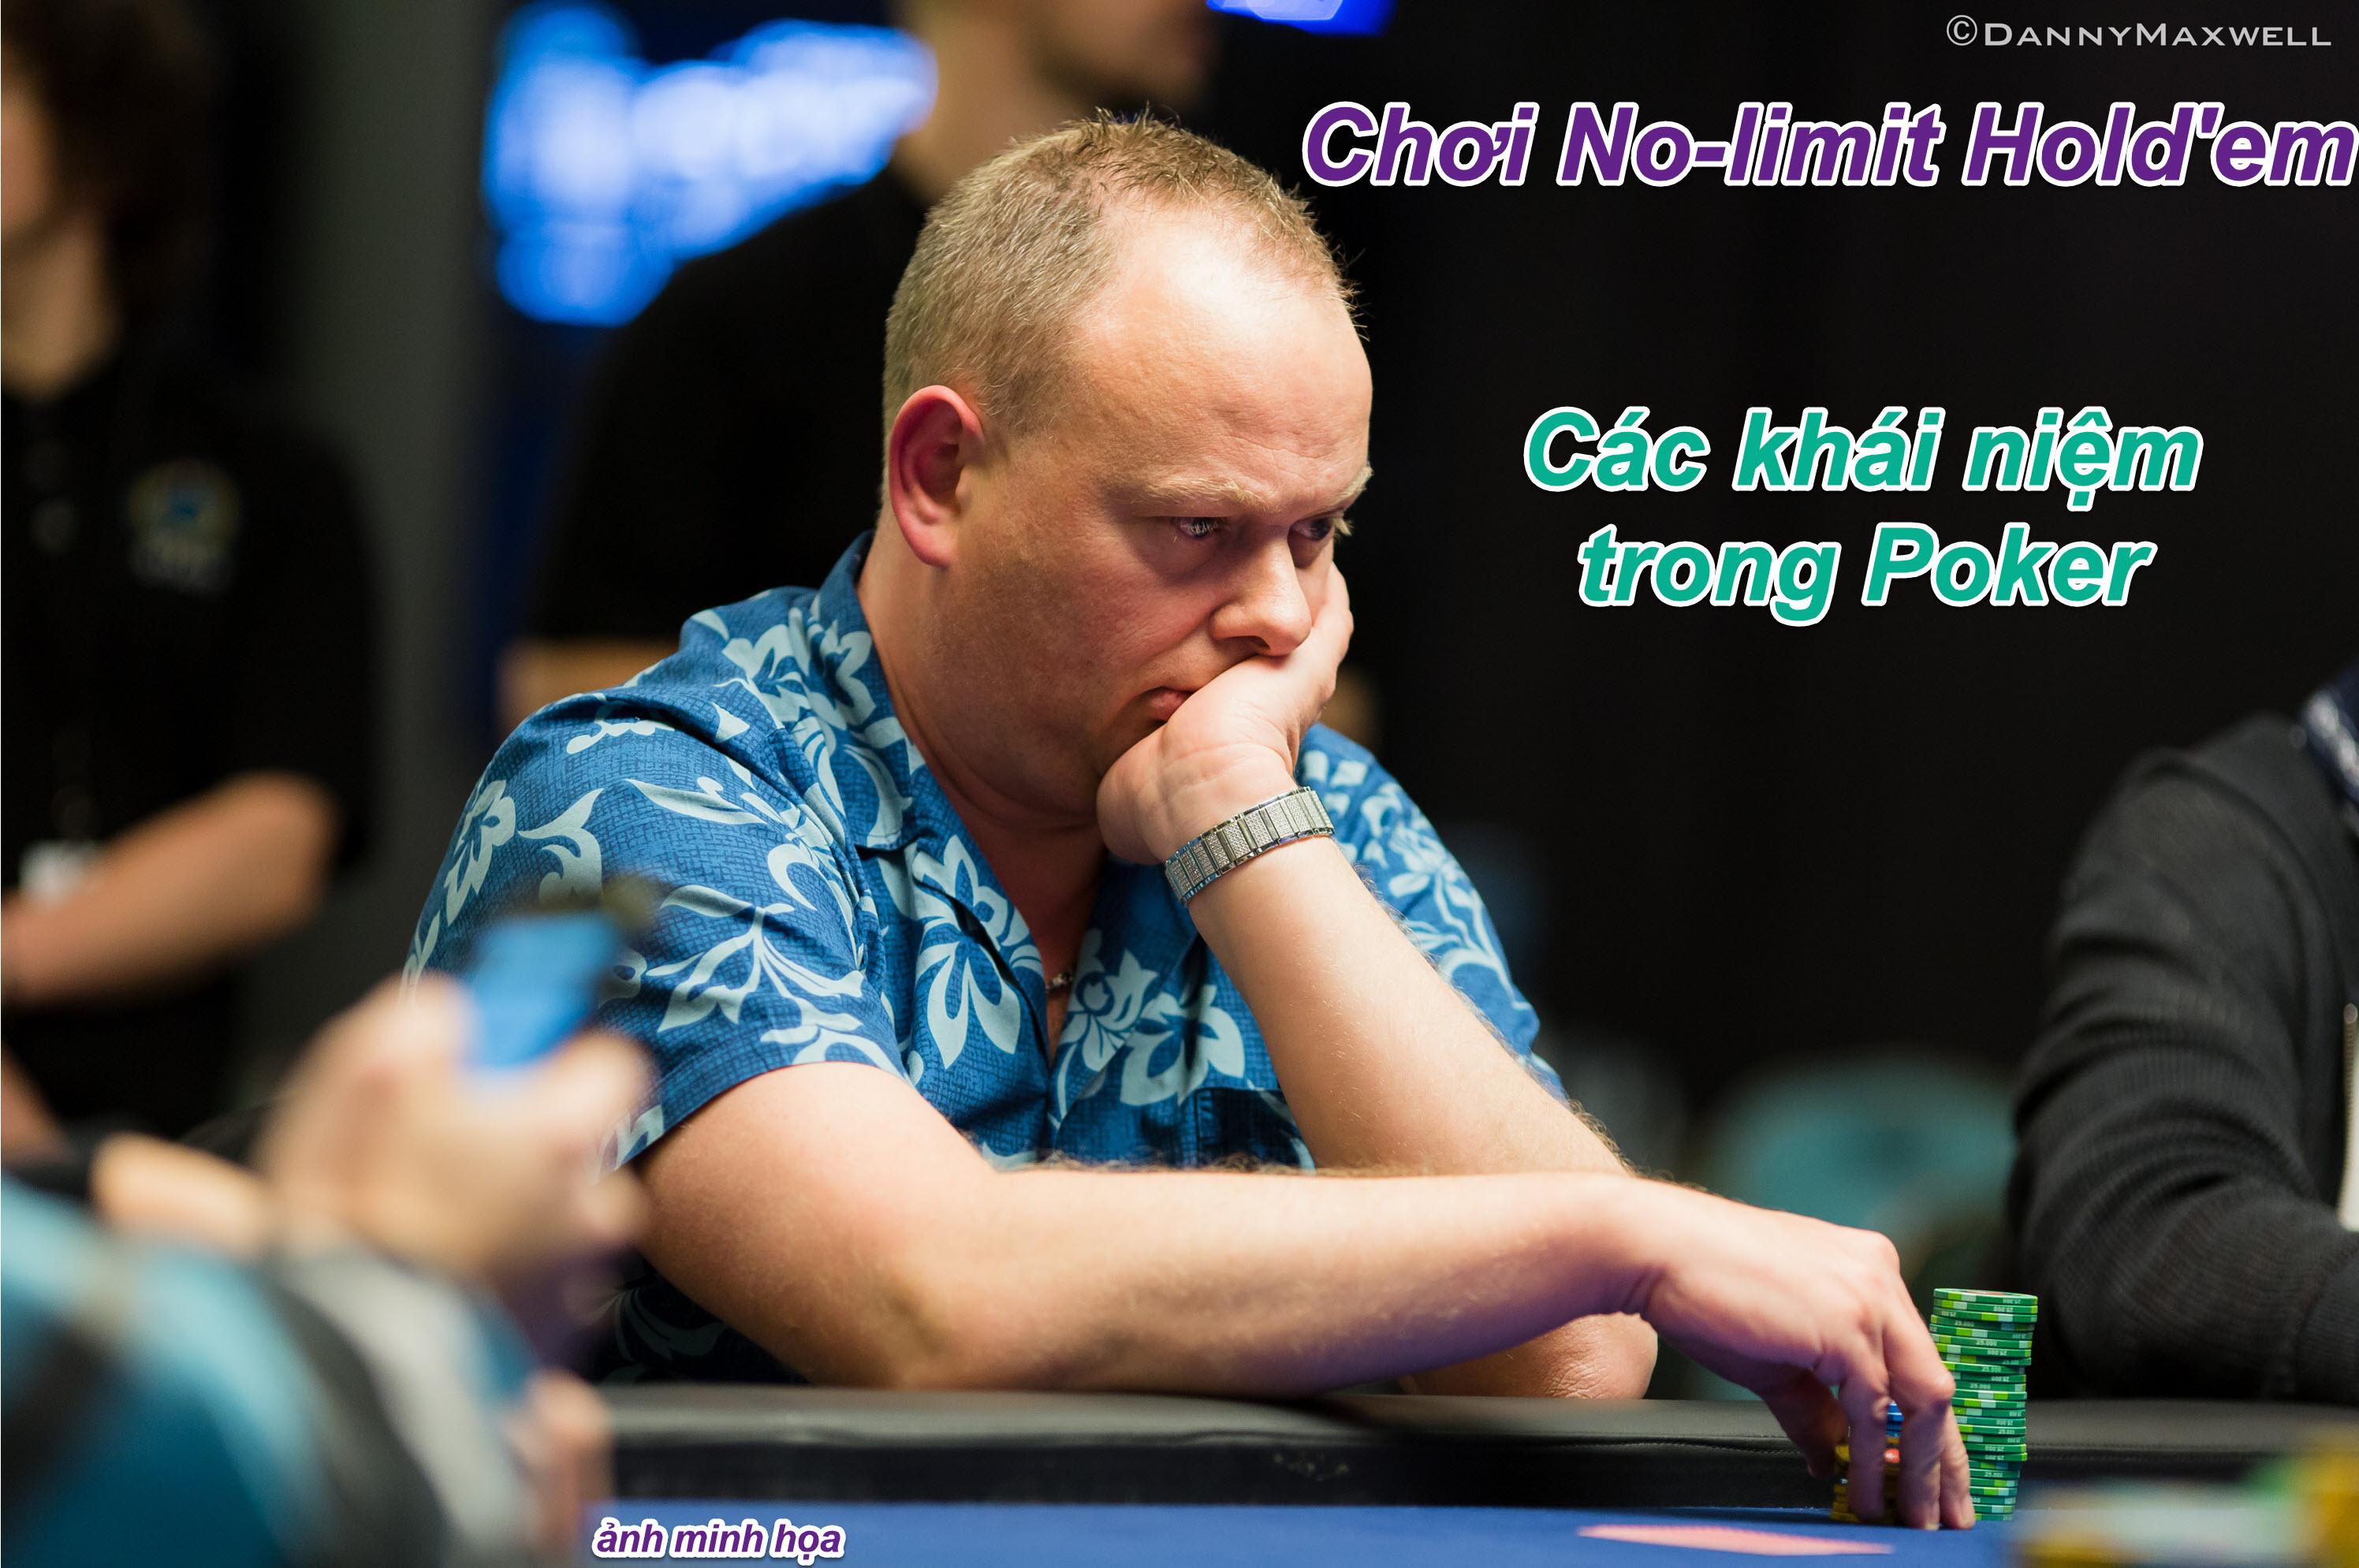 Cac khai niem trong Poker 01 ver 01.jpg